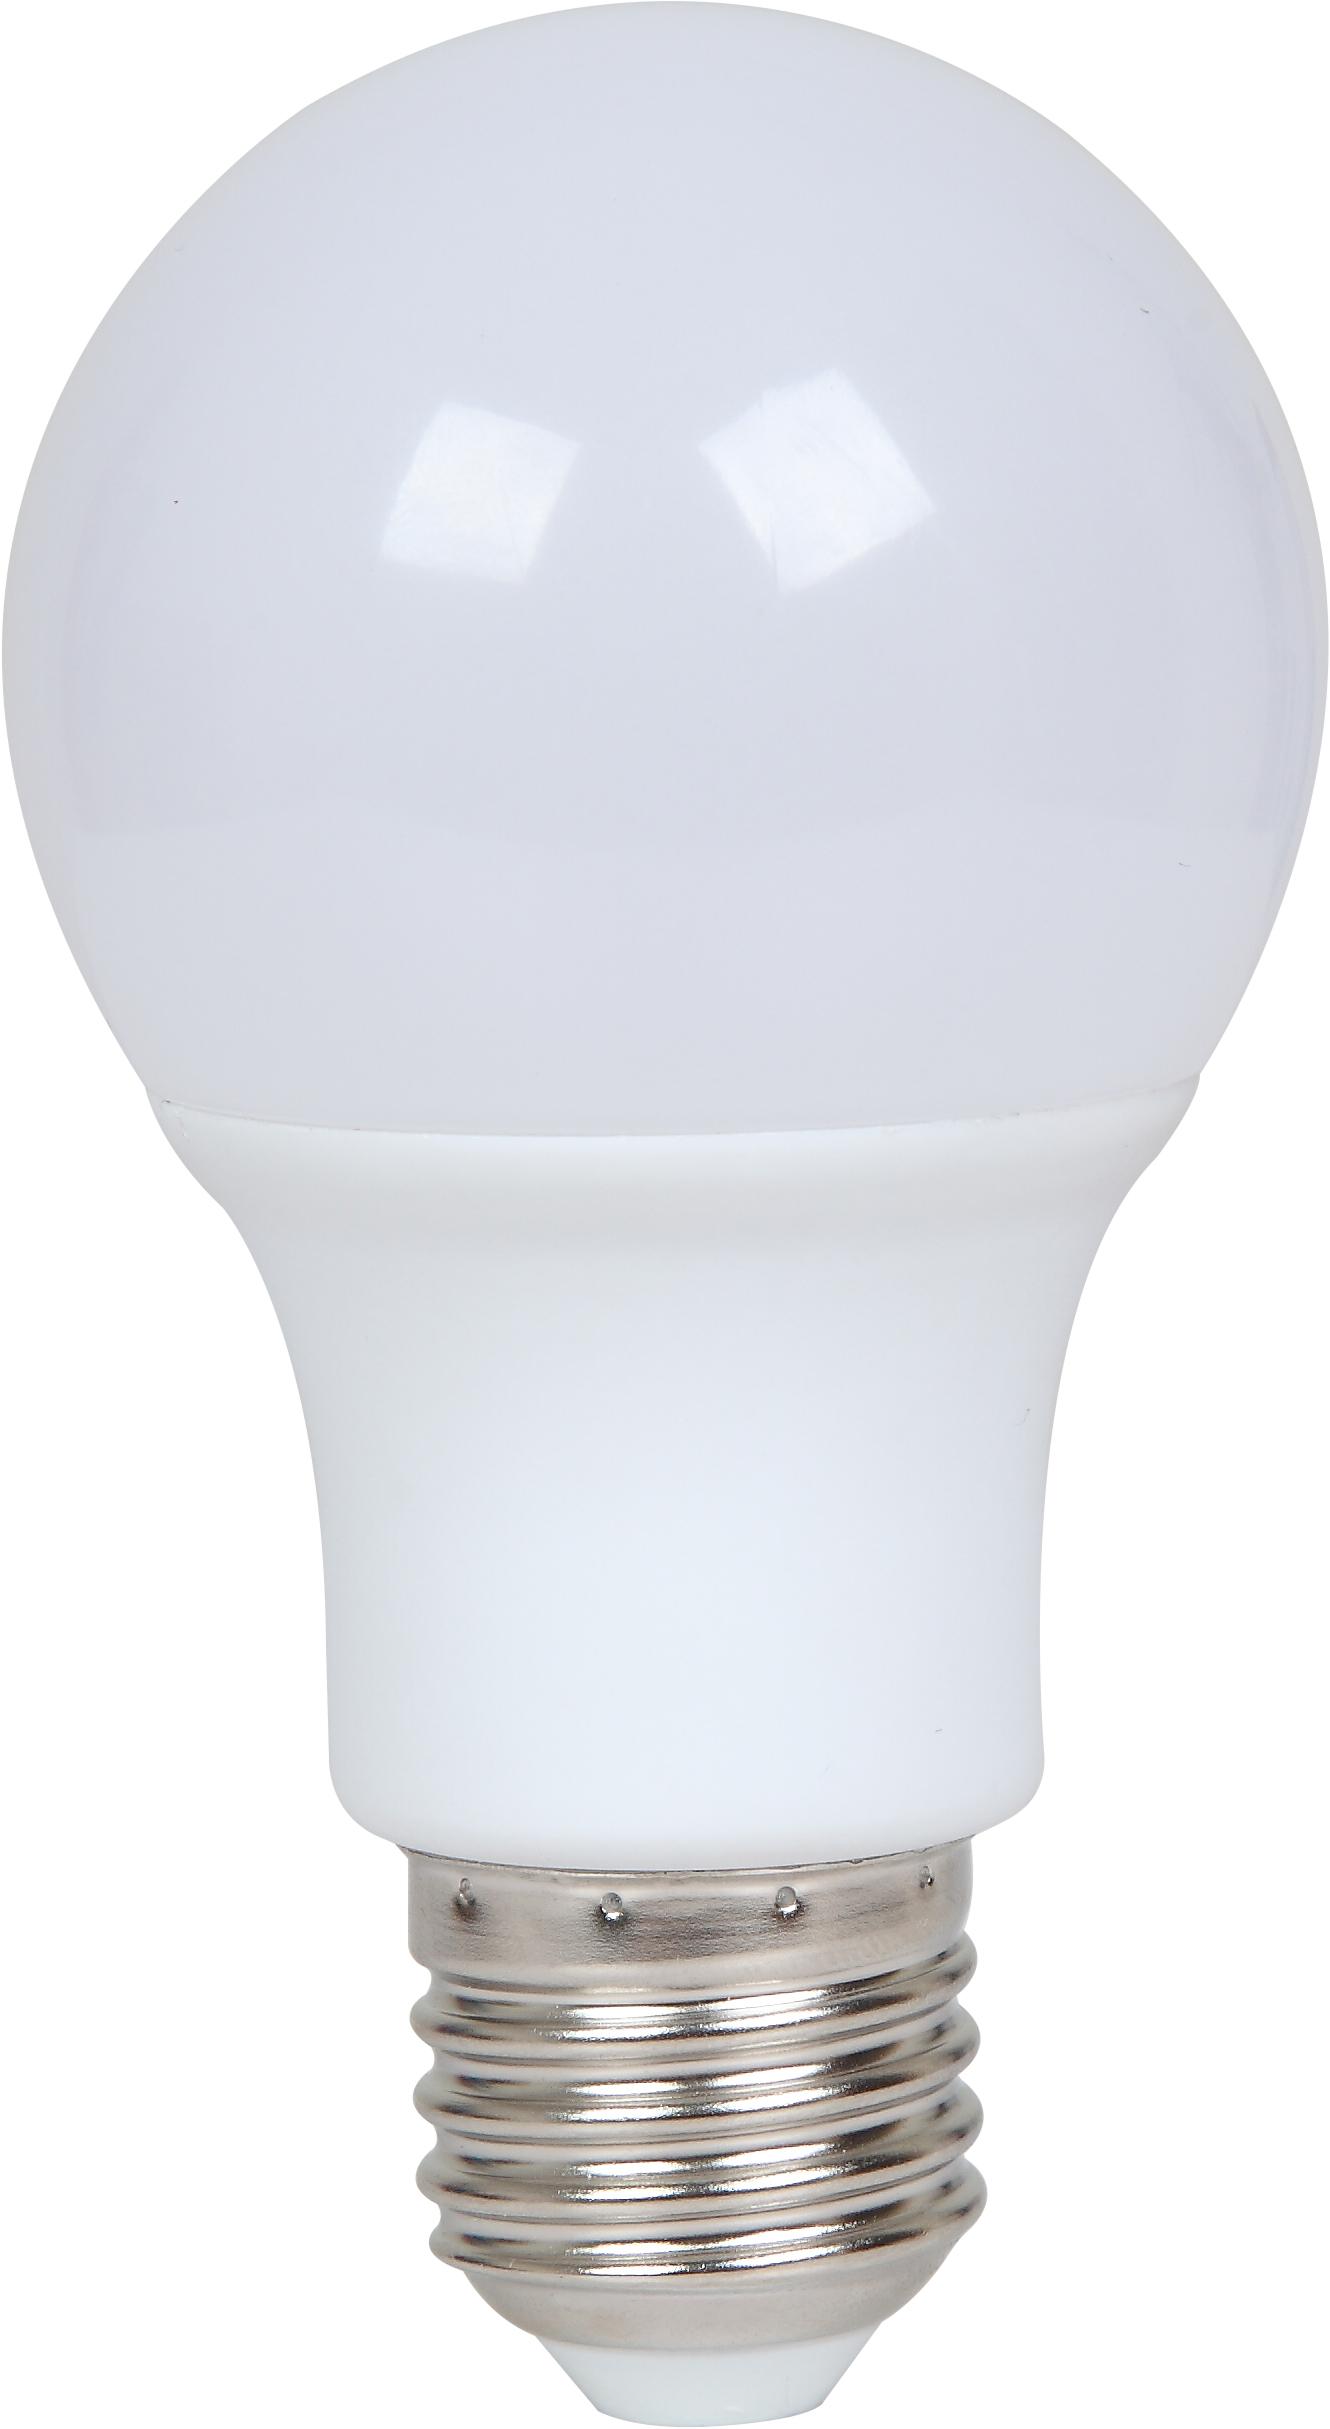 RETLUX RLL 243 A60 E27 žárovka 7W WW